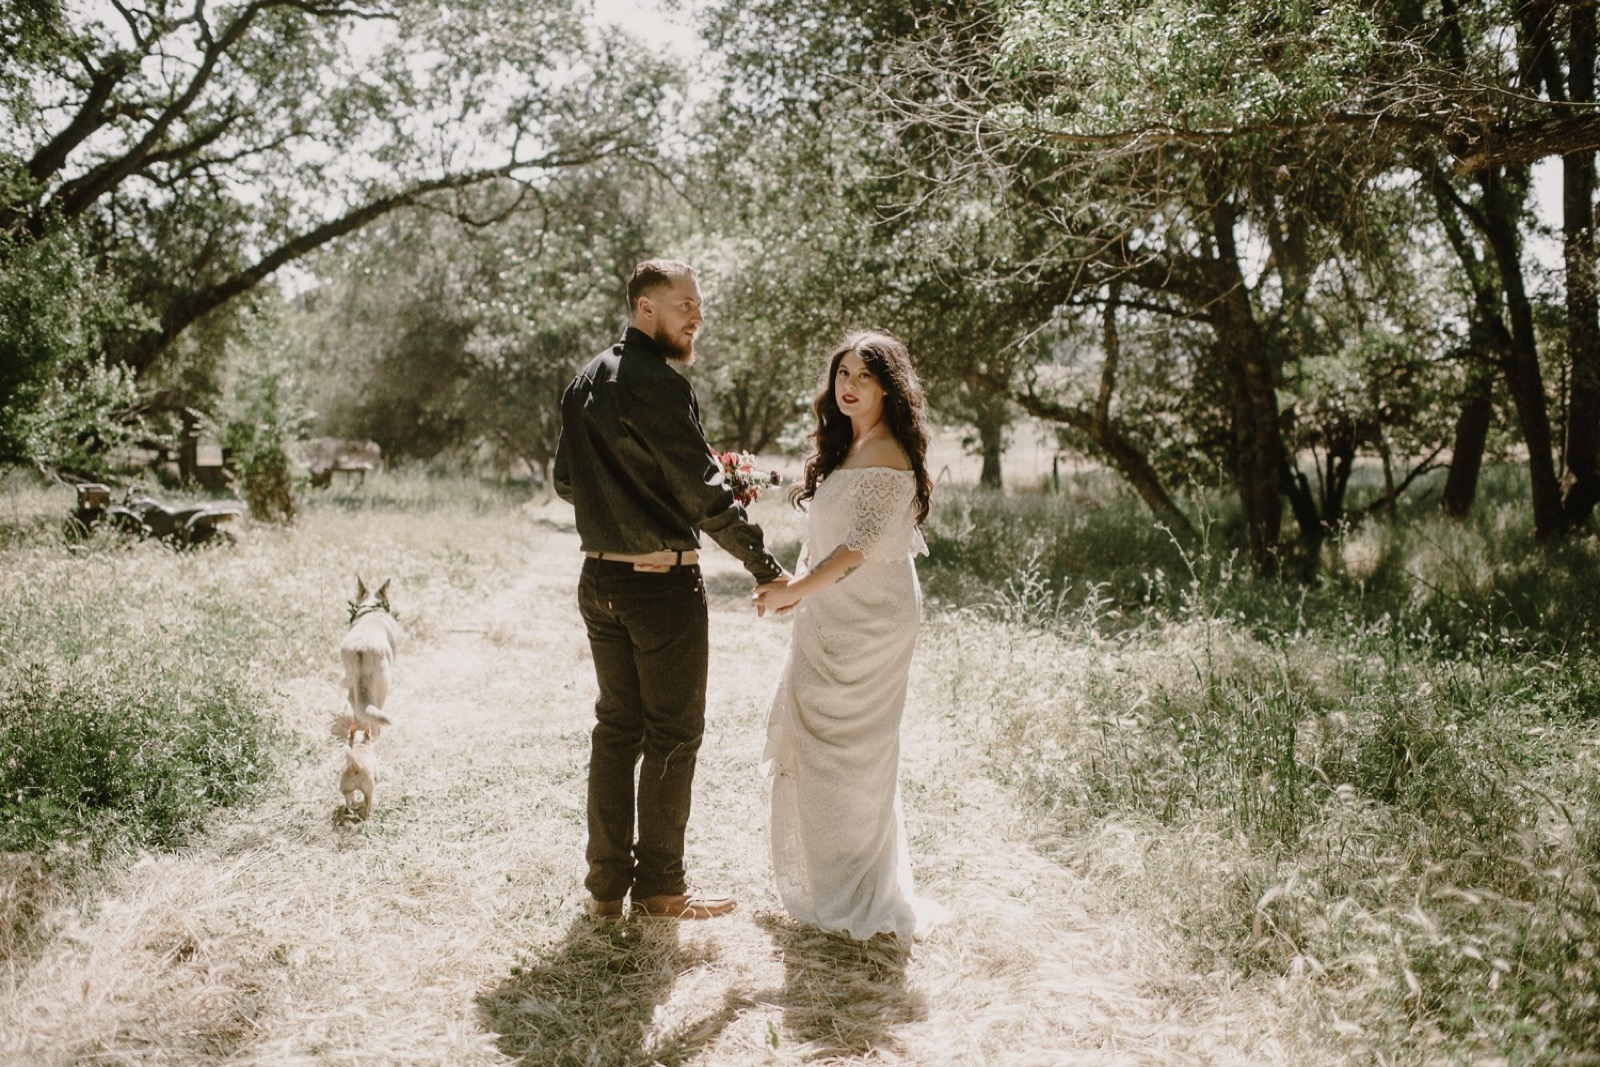 047_California_Ranch_Wedding106.jpg